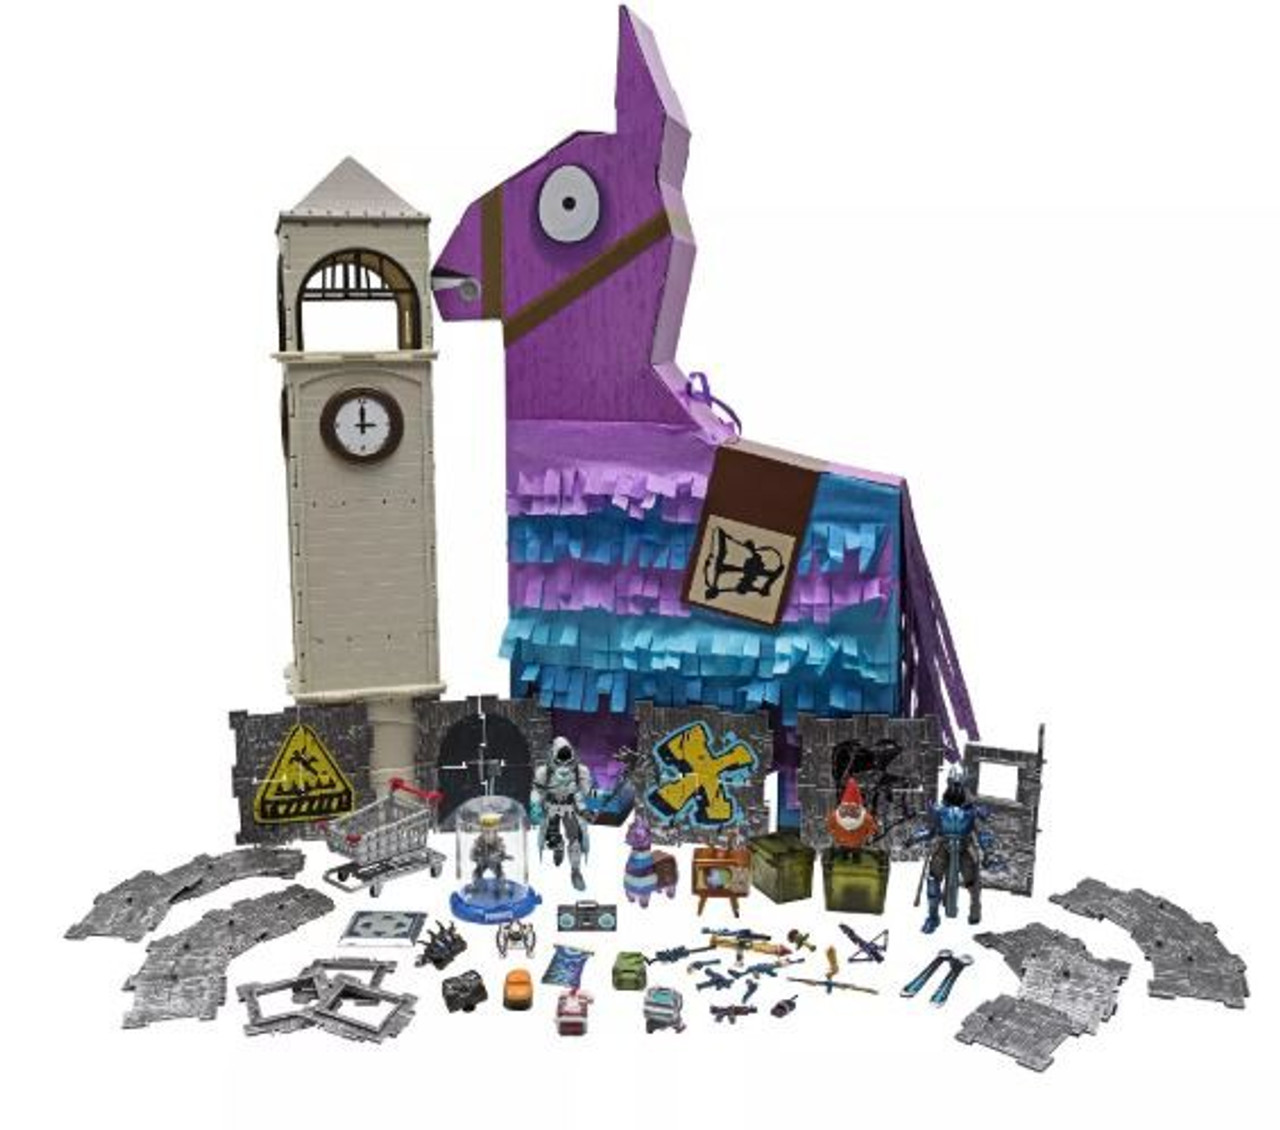 Fortnite Jumbo Llama Loot Pinata 4 Playset Jazwares - ToyWiz